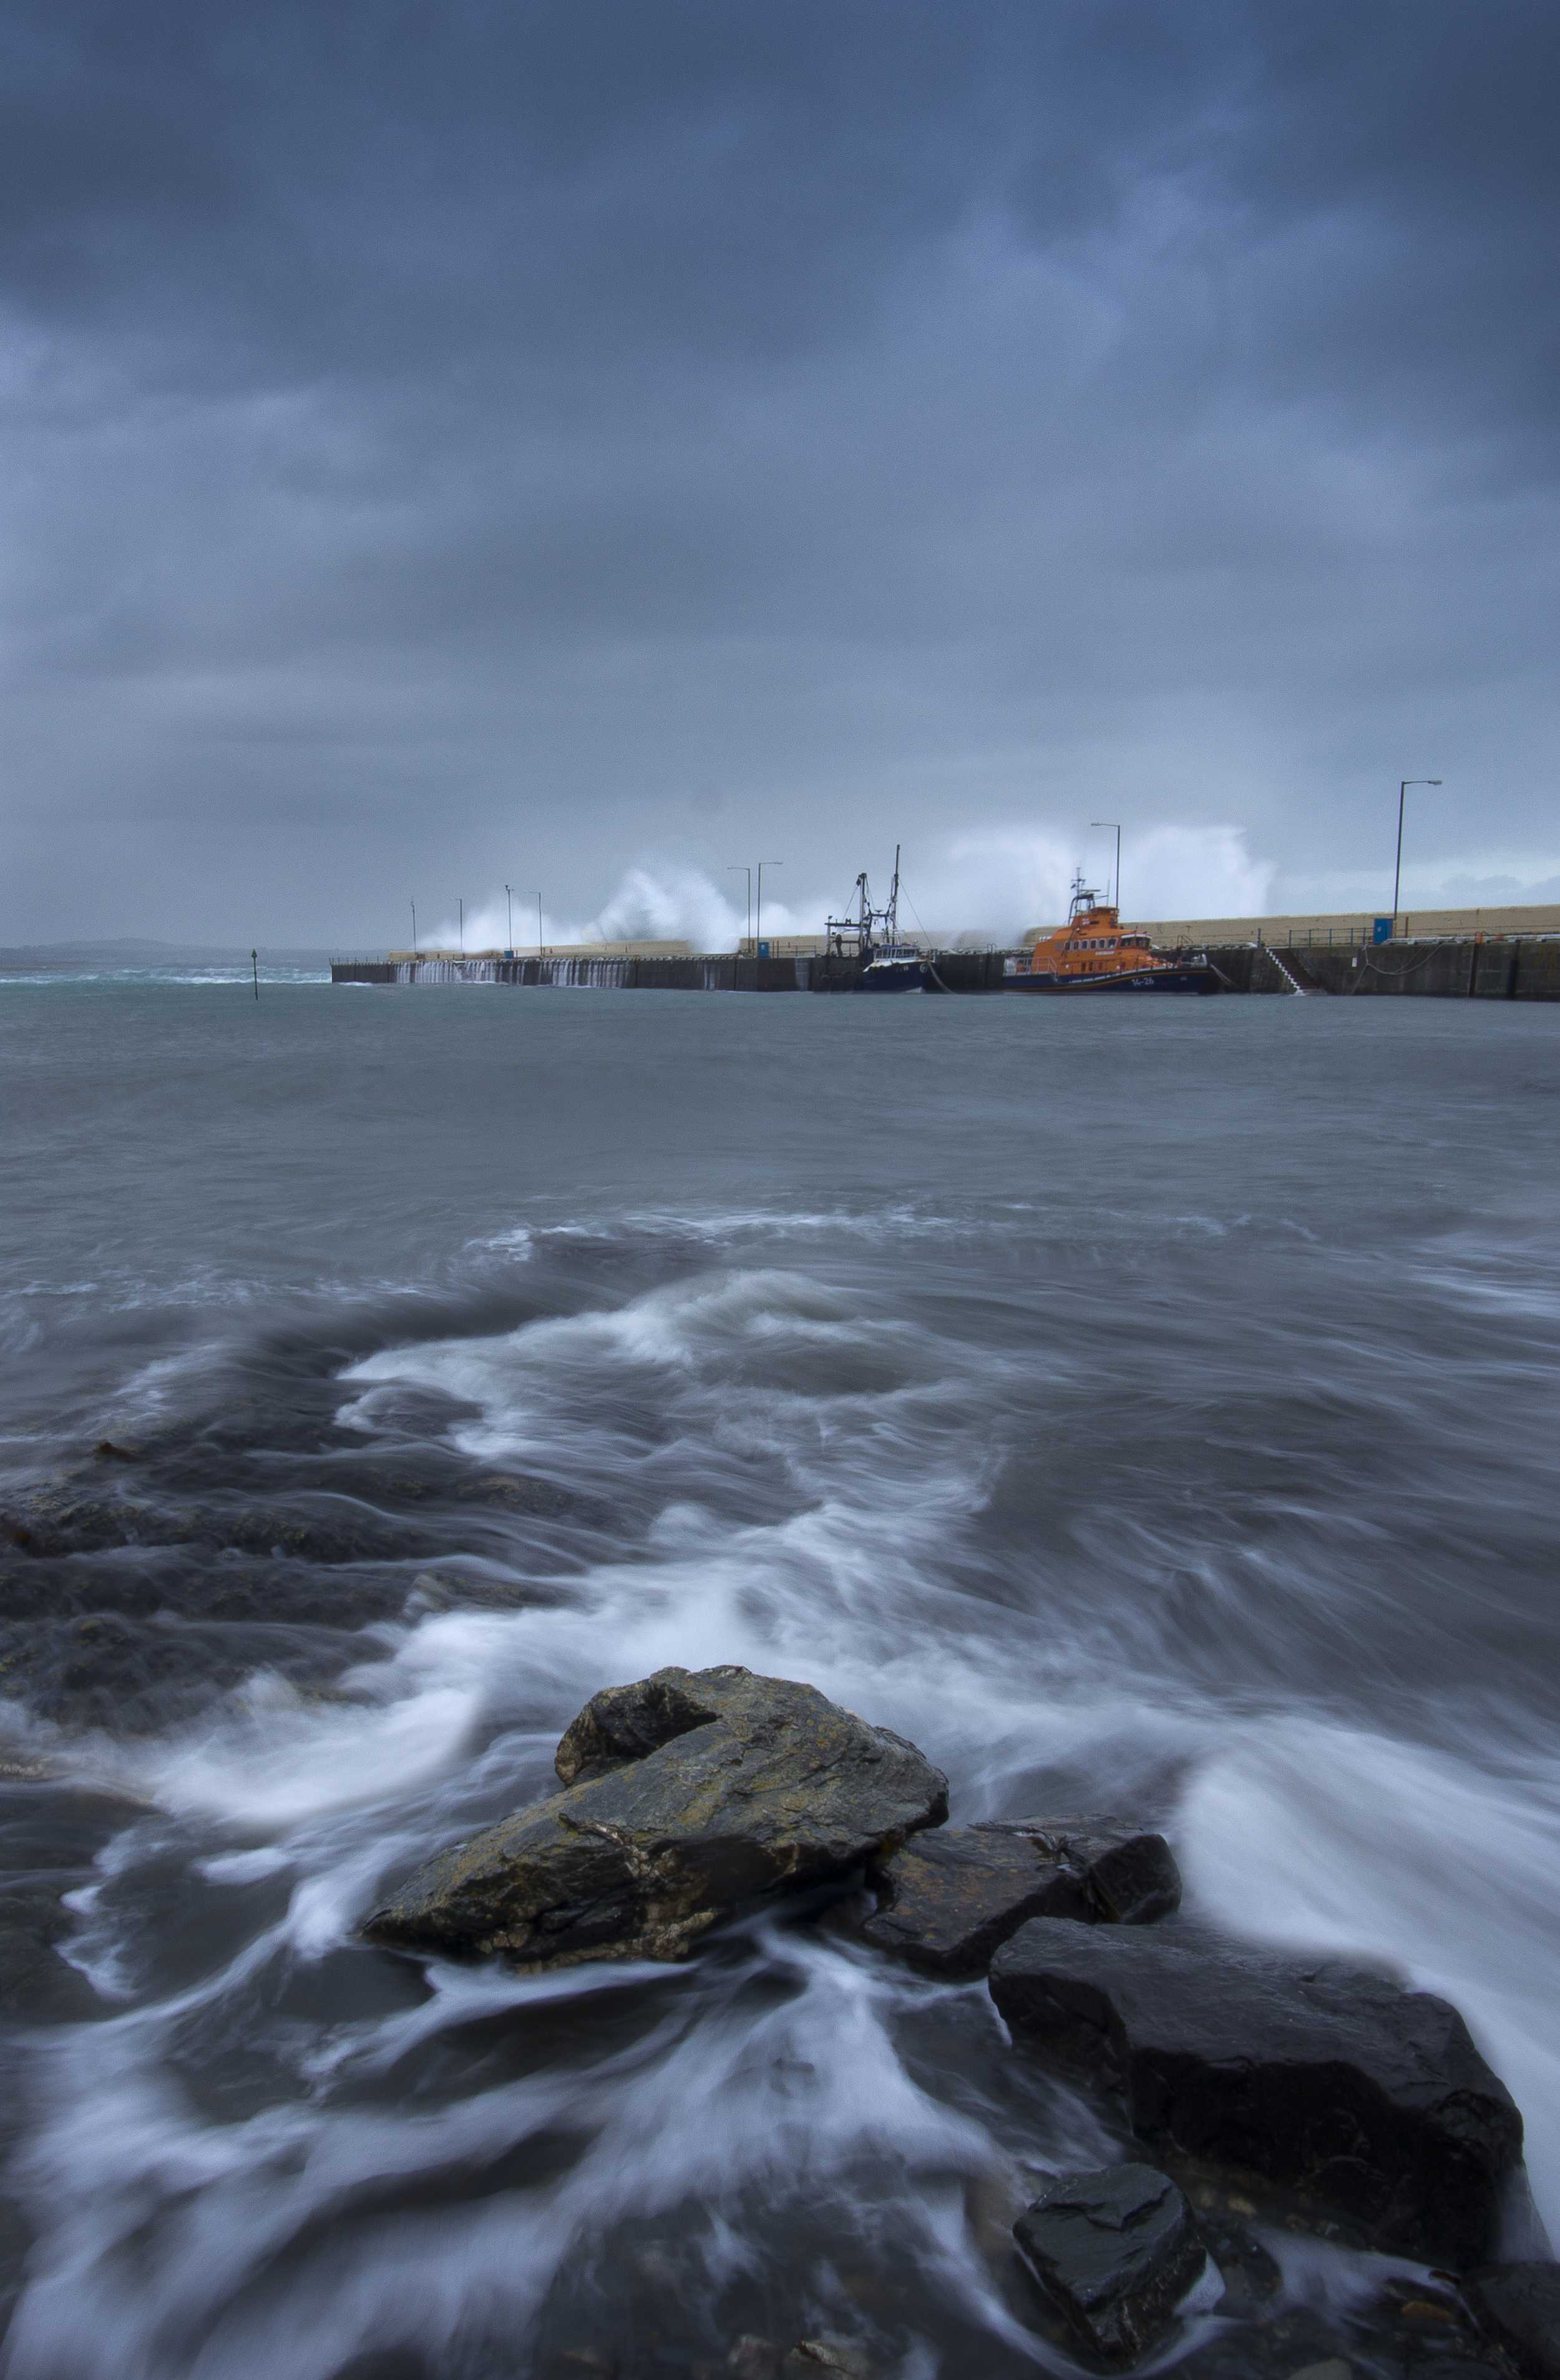 Port St Mary Breakwater